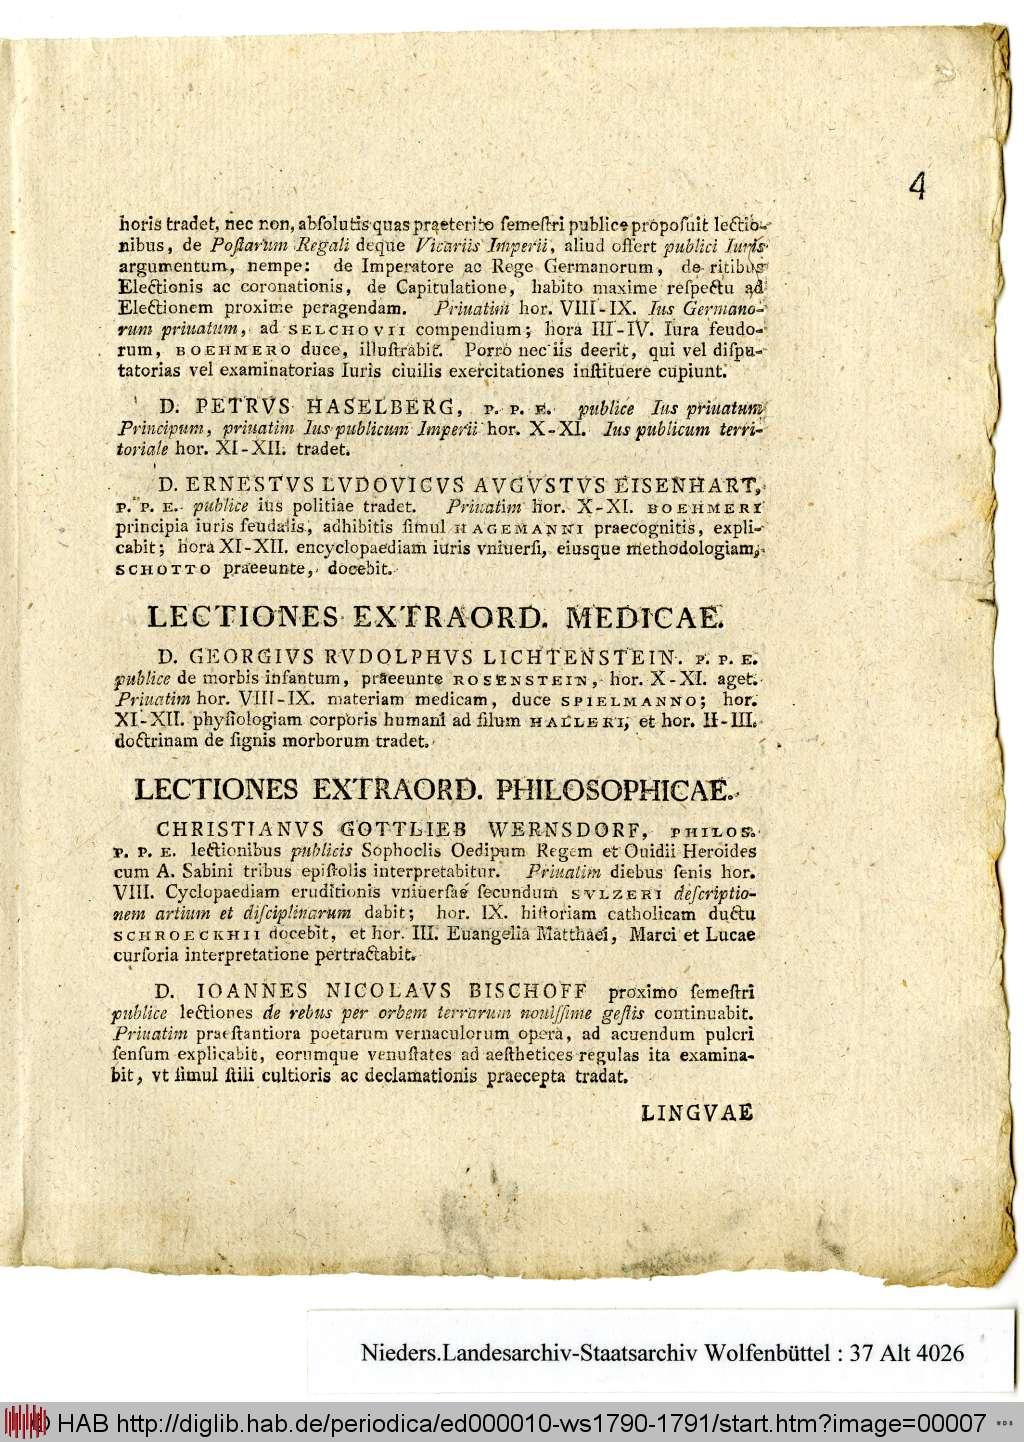 http://diglib.hab.de/periodica/ed000010-ws1790-1791/00007.jpg